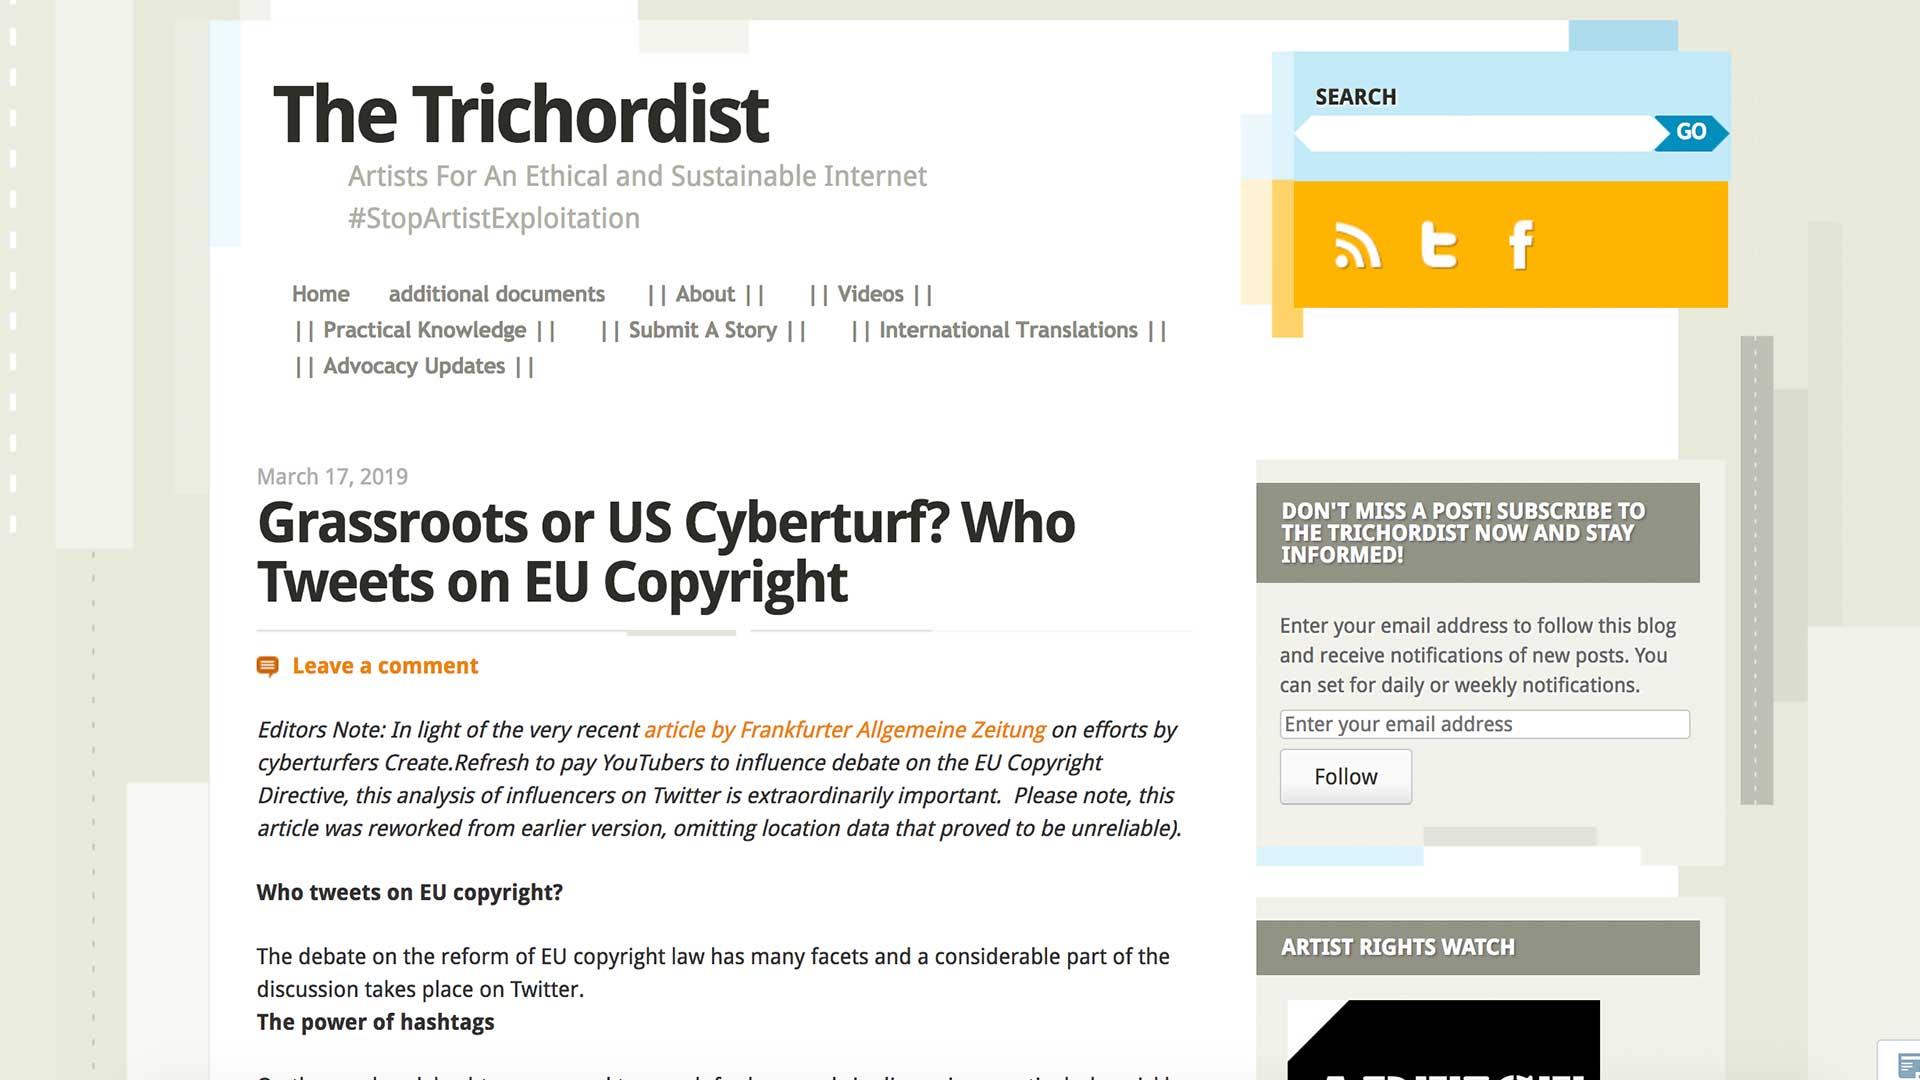 Fairness Rocks News Grassroots or US Cyberturf? Who Tweets on EU Copyright